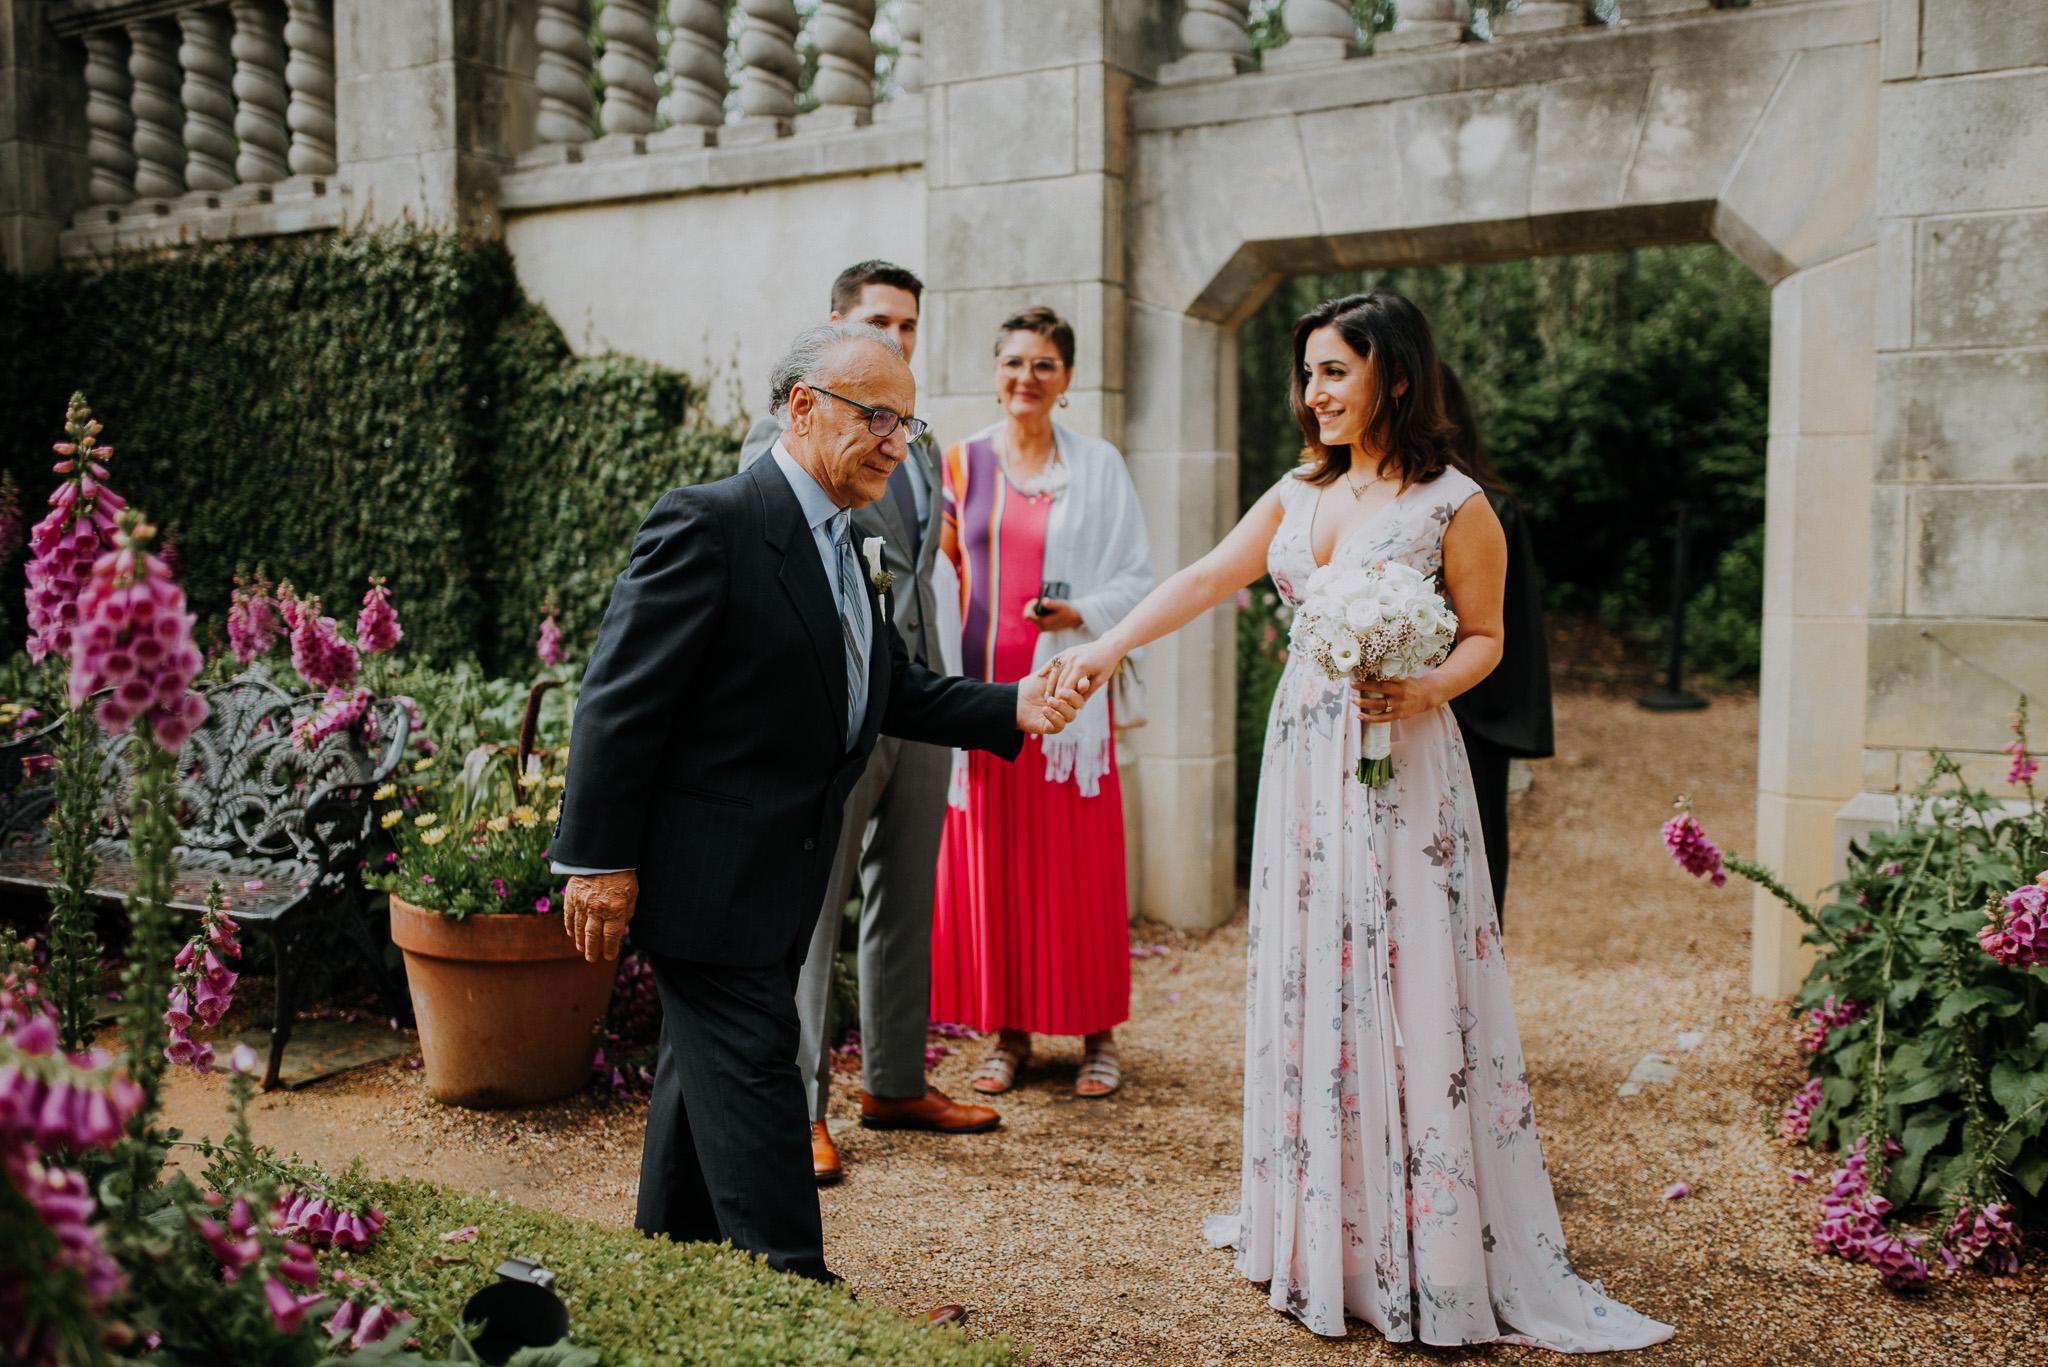 Dallas-fort-worth-wedding-photographer-dallas-arboretum-intimate-wedding-dallas-texas-11